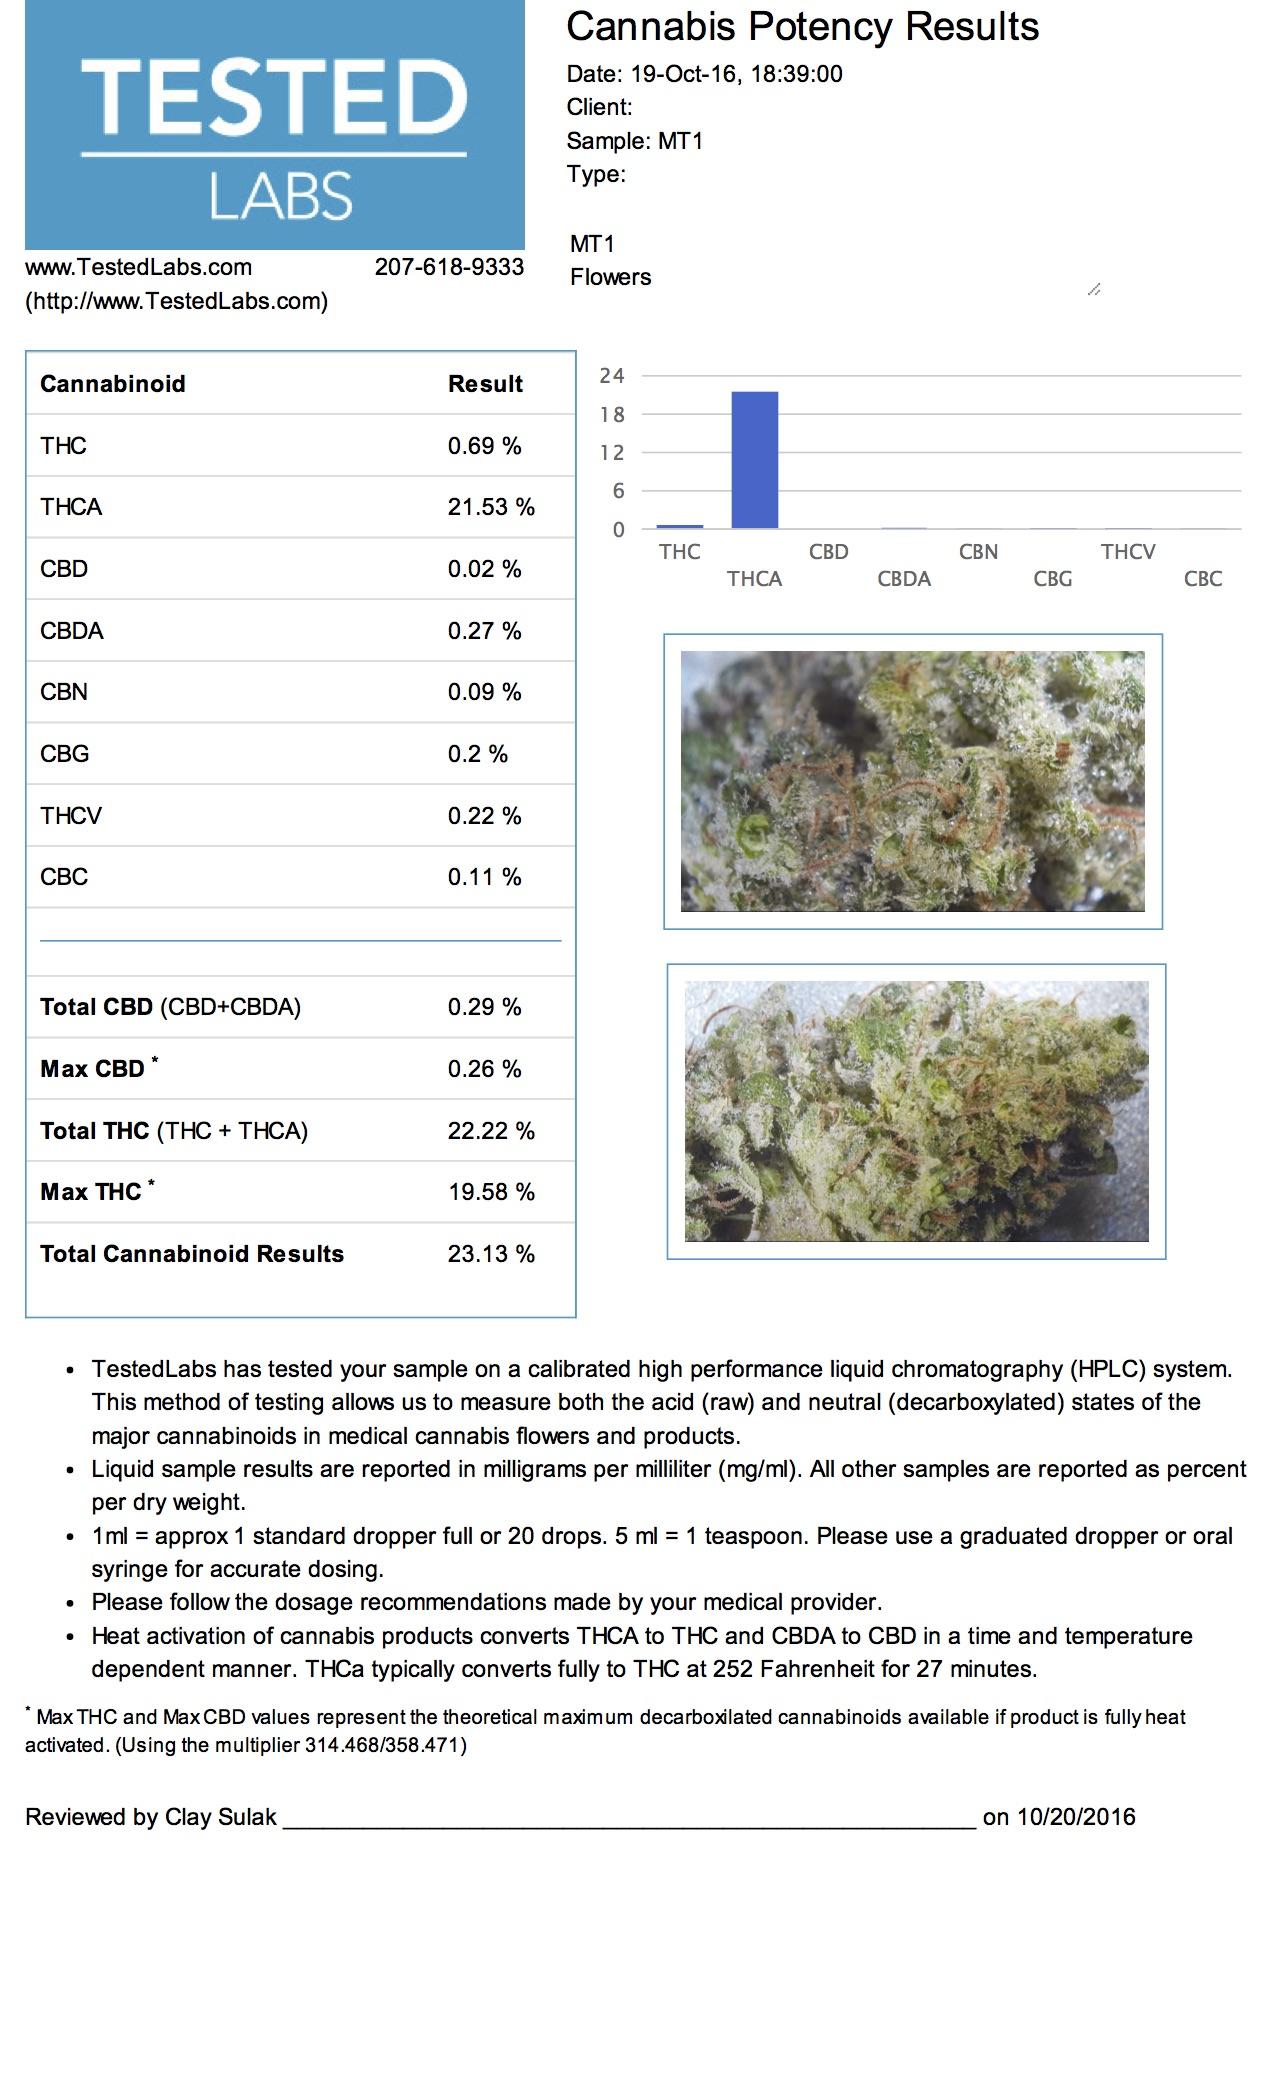 Moontang (Pheno 1) (Cannabinoid)